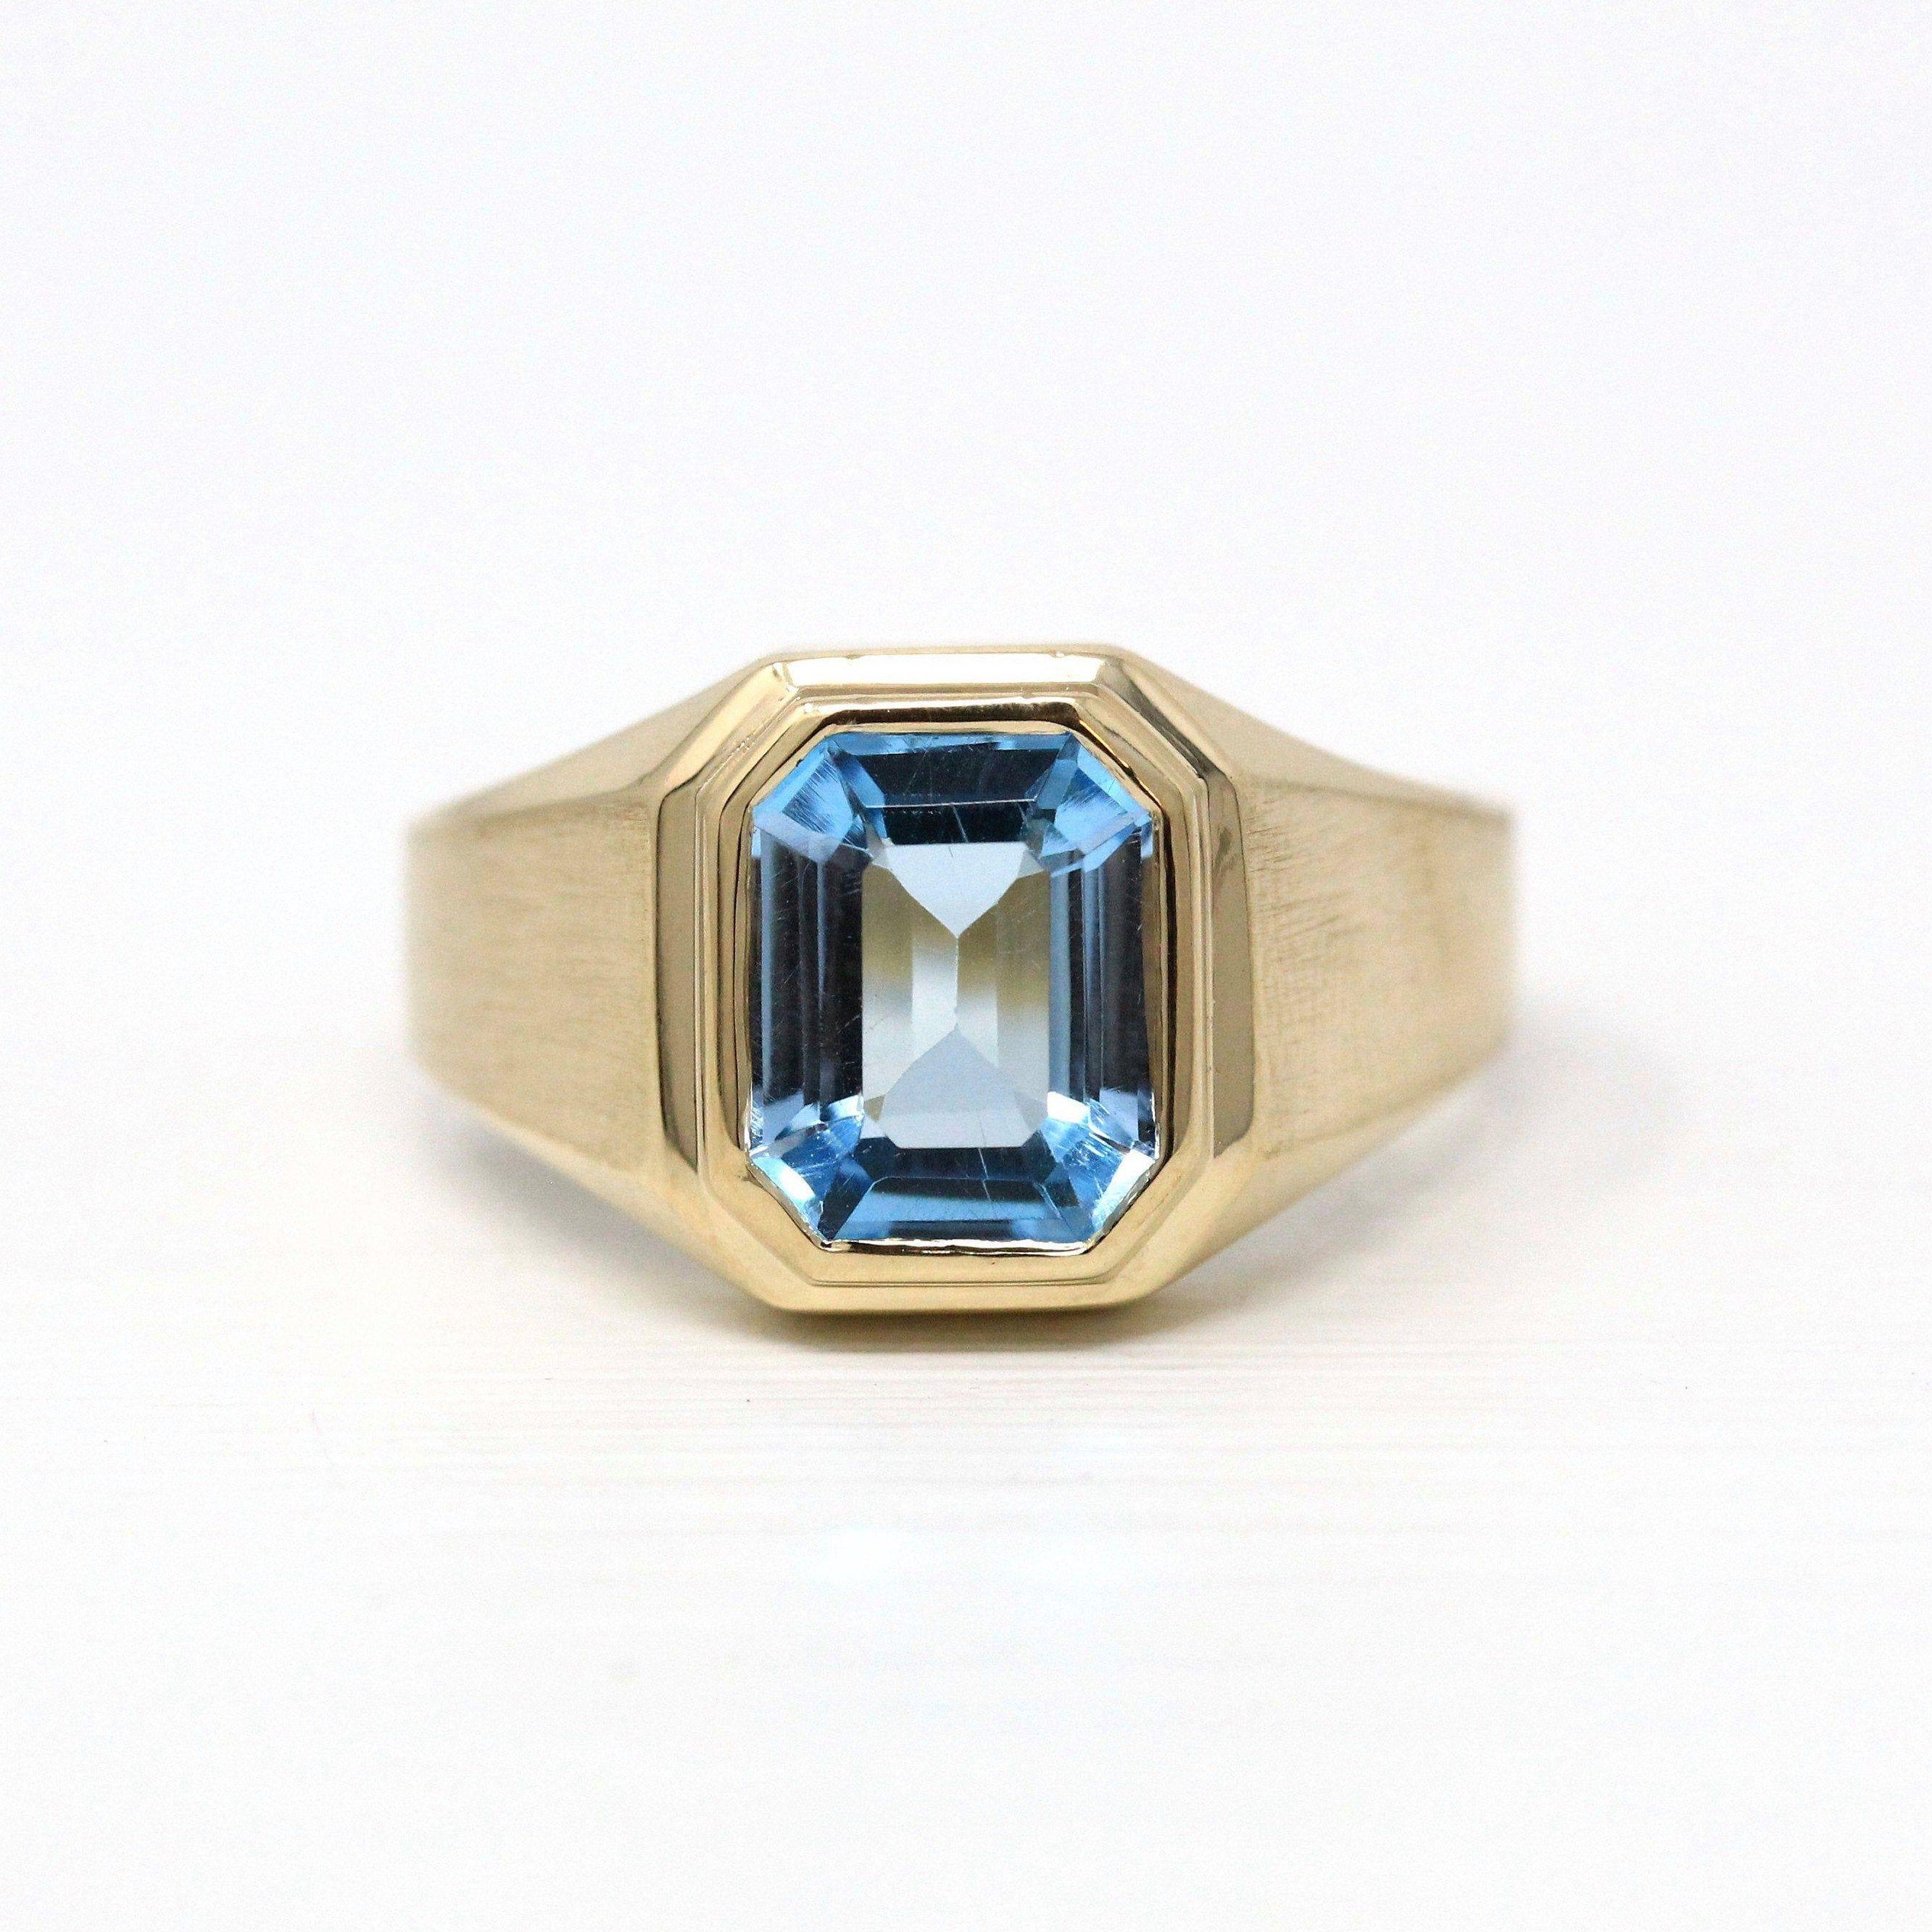 Vintage Onyx Ring Retro 14k Yellow Gold Genuine .03 CT Diamond Gemstone Circa 1940s Era Size 6 14  Black Fine Jewelry